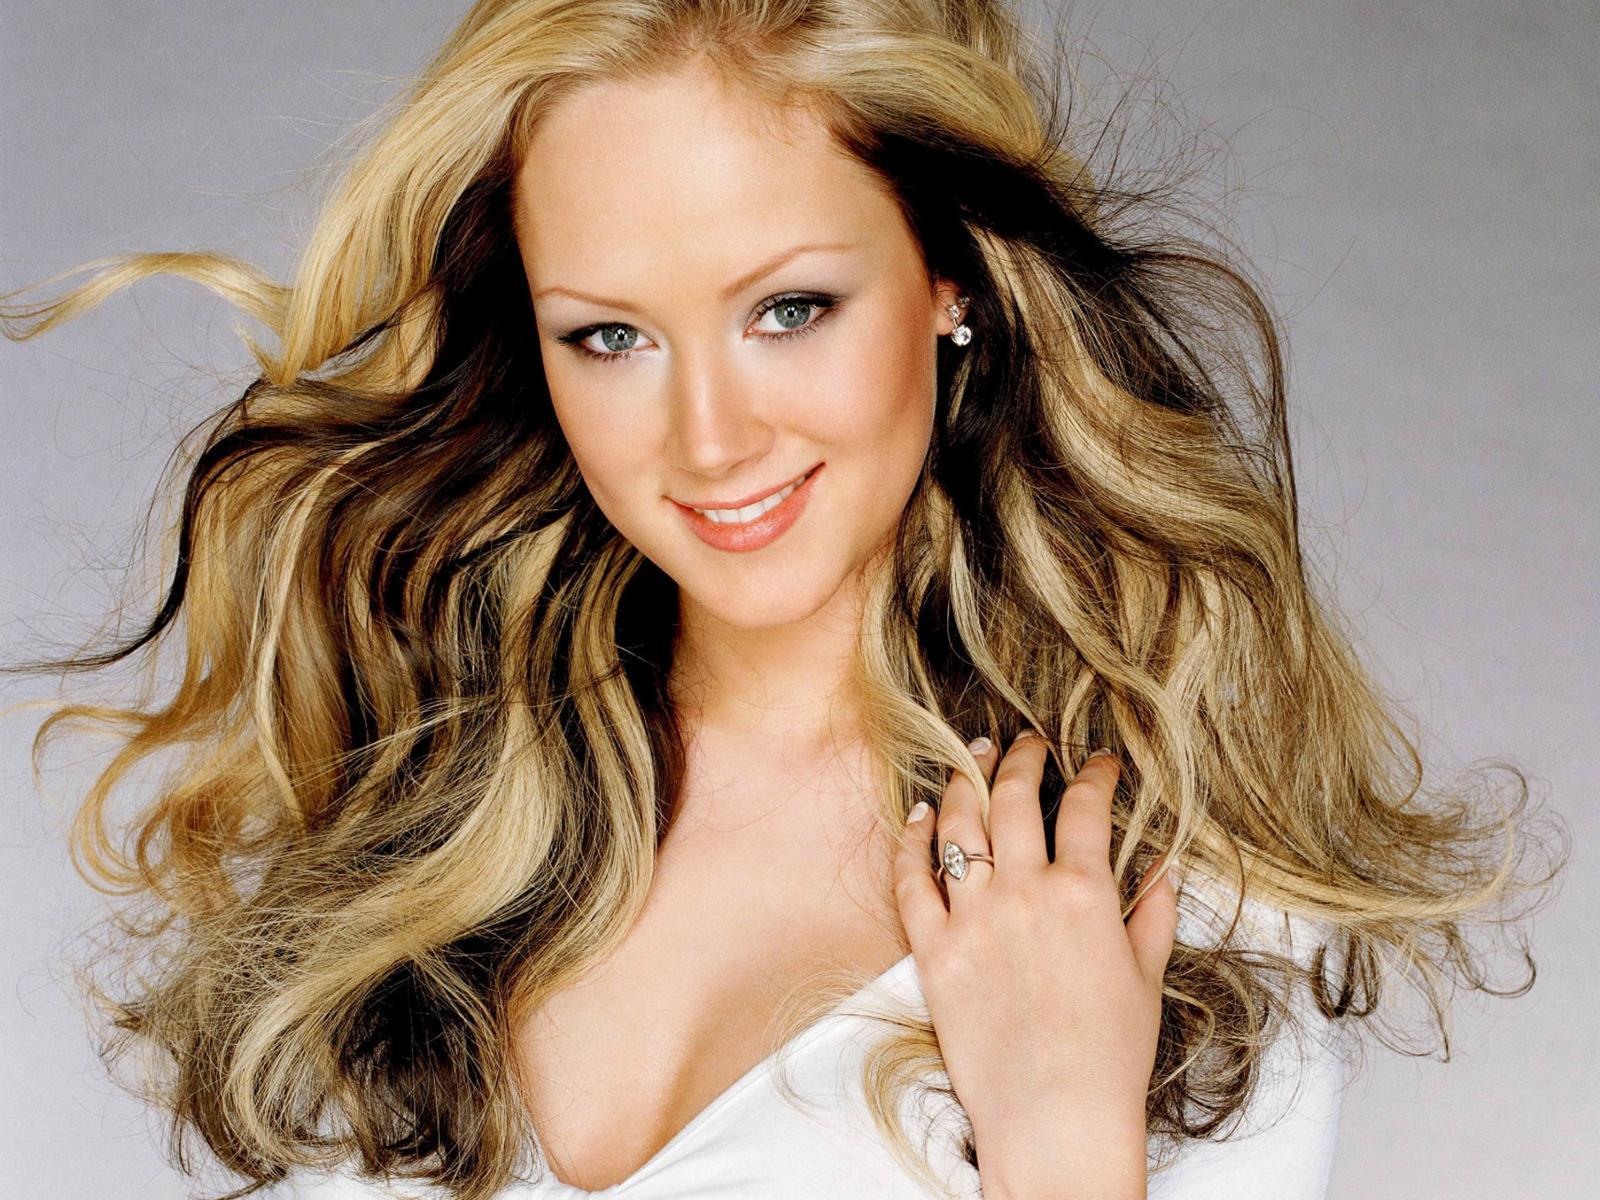 http://2.bp.blogspot.com/_23SmjNby4-o/TOhwEGXovGI/AAAAAAAAALs/8v4ciOQEohs/s1600/natasha_thomas_hair_desktop_wallpaper_87294.jpg